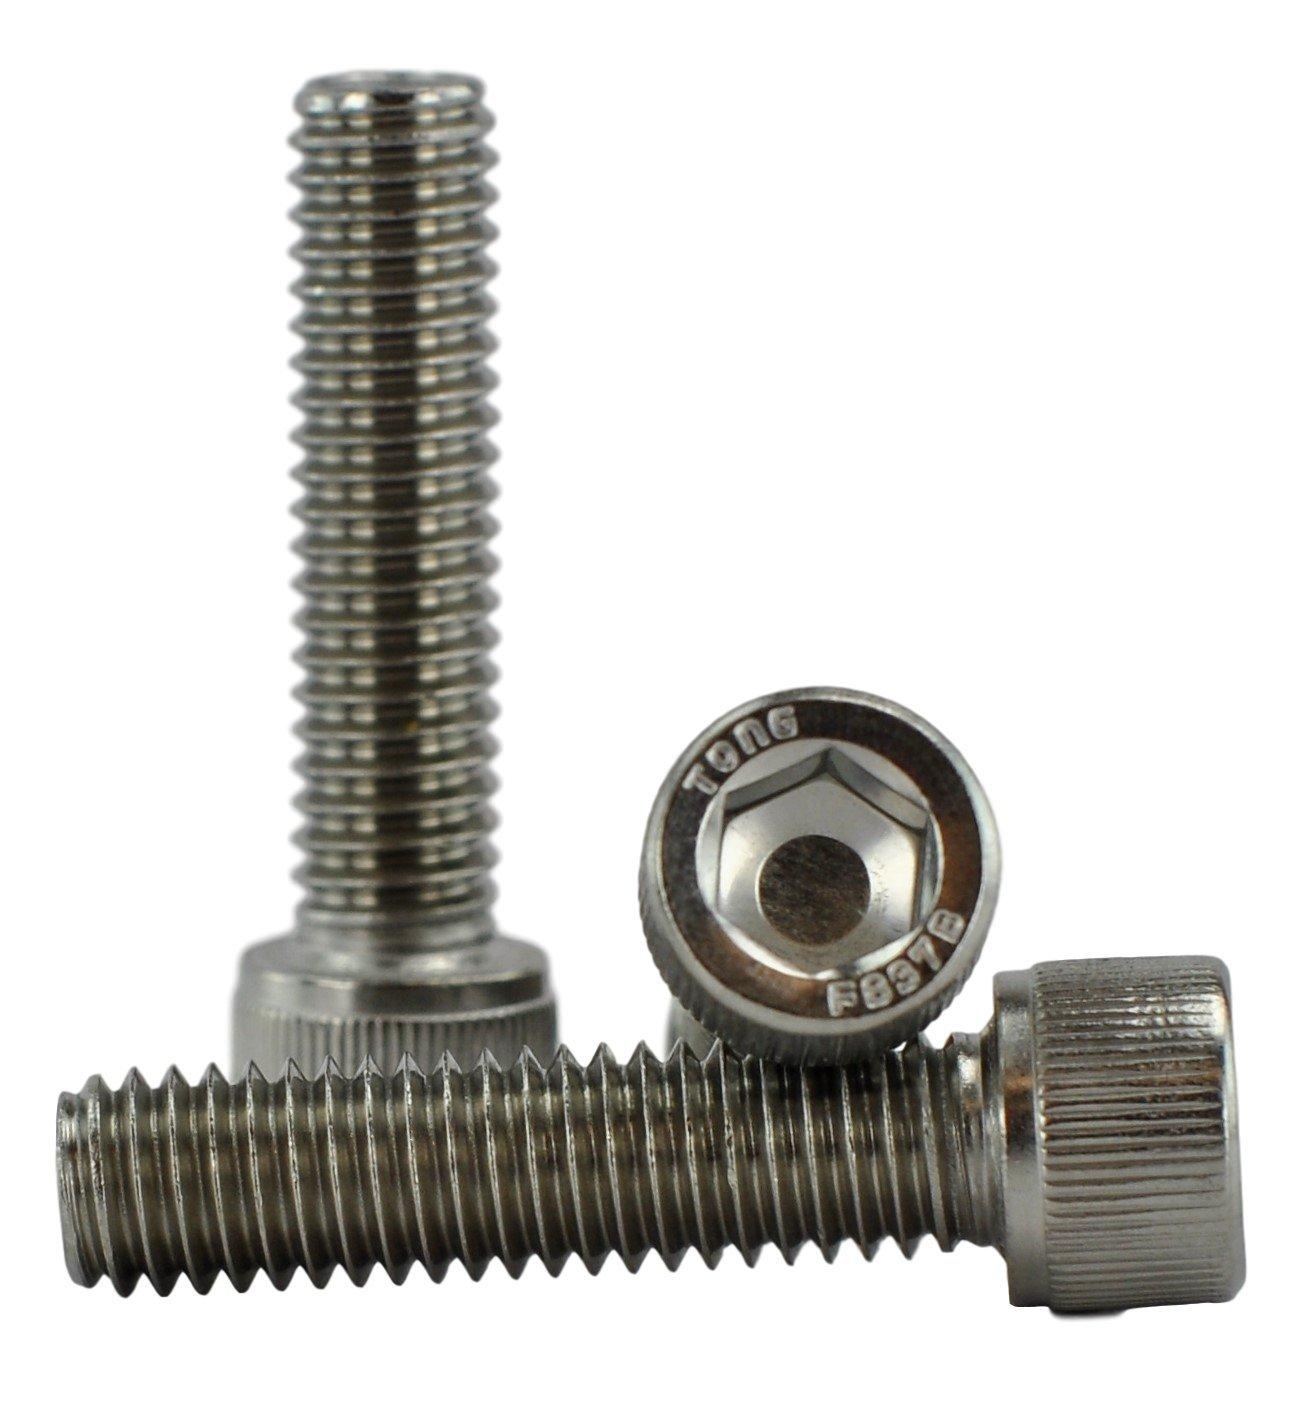 Alloy Steel Set Screw Thread Size 3//8-16 Thread Size 3//8-16 FastenerParts